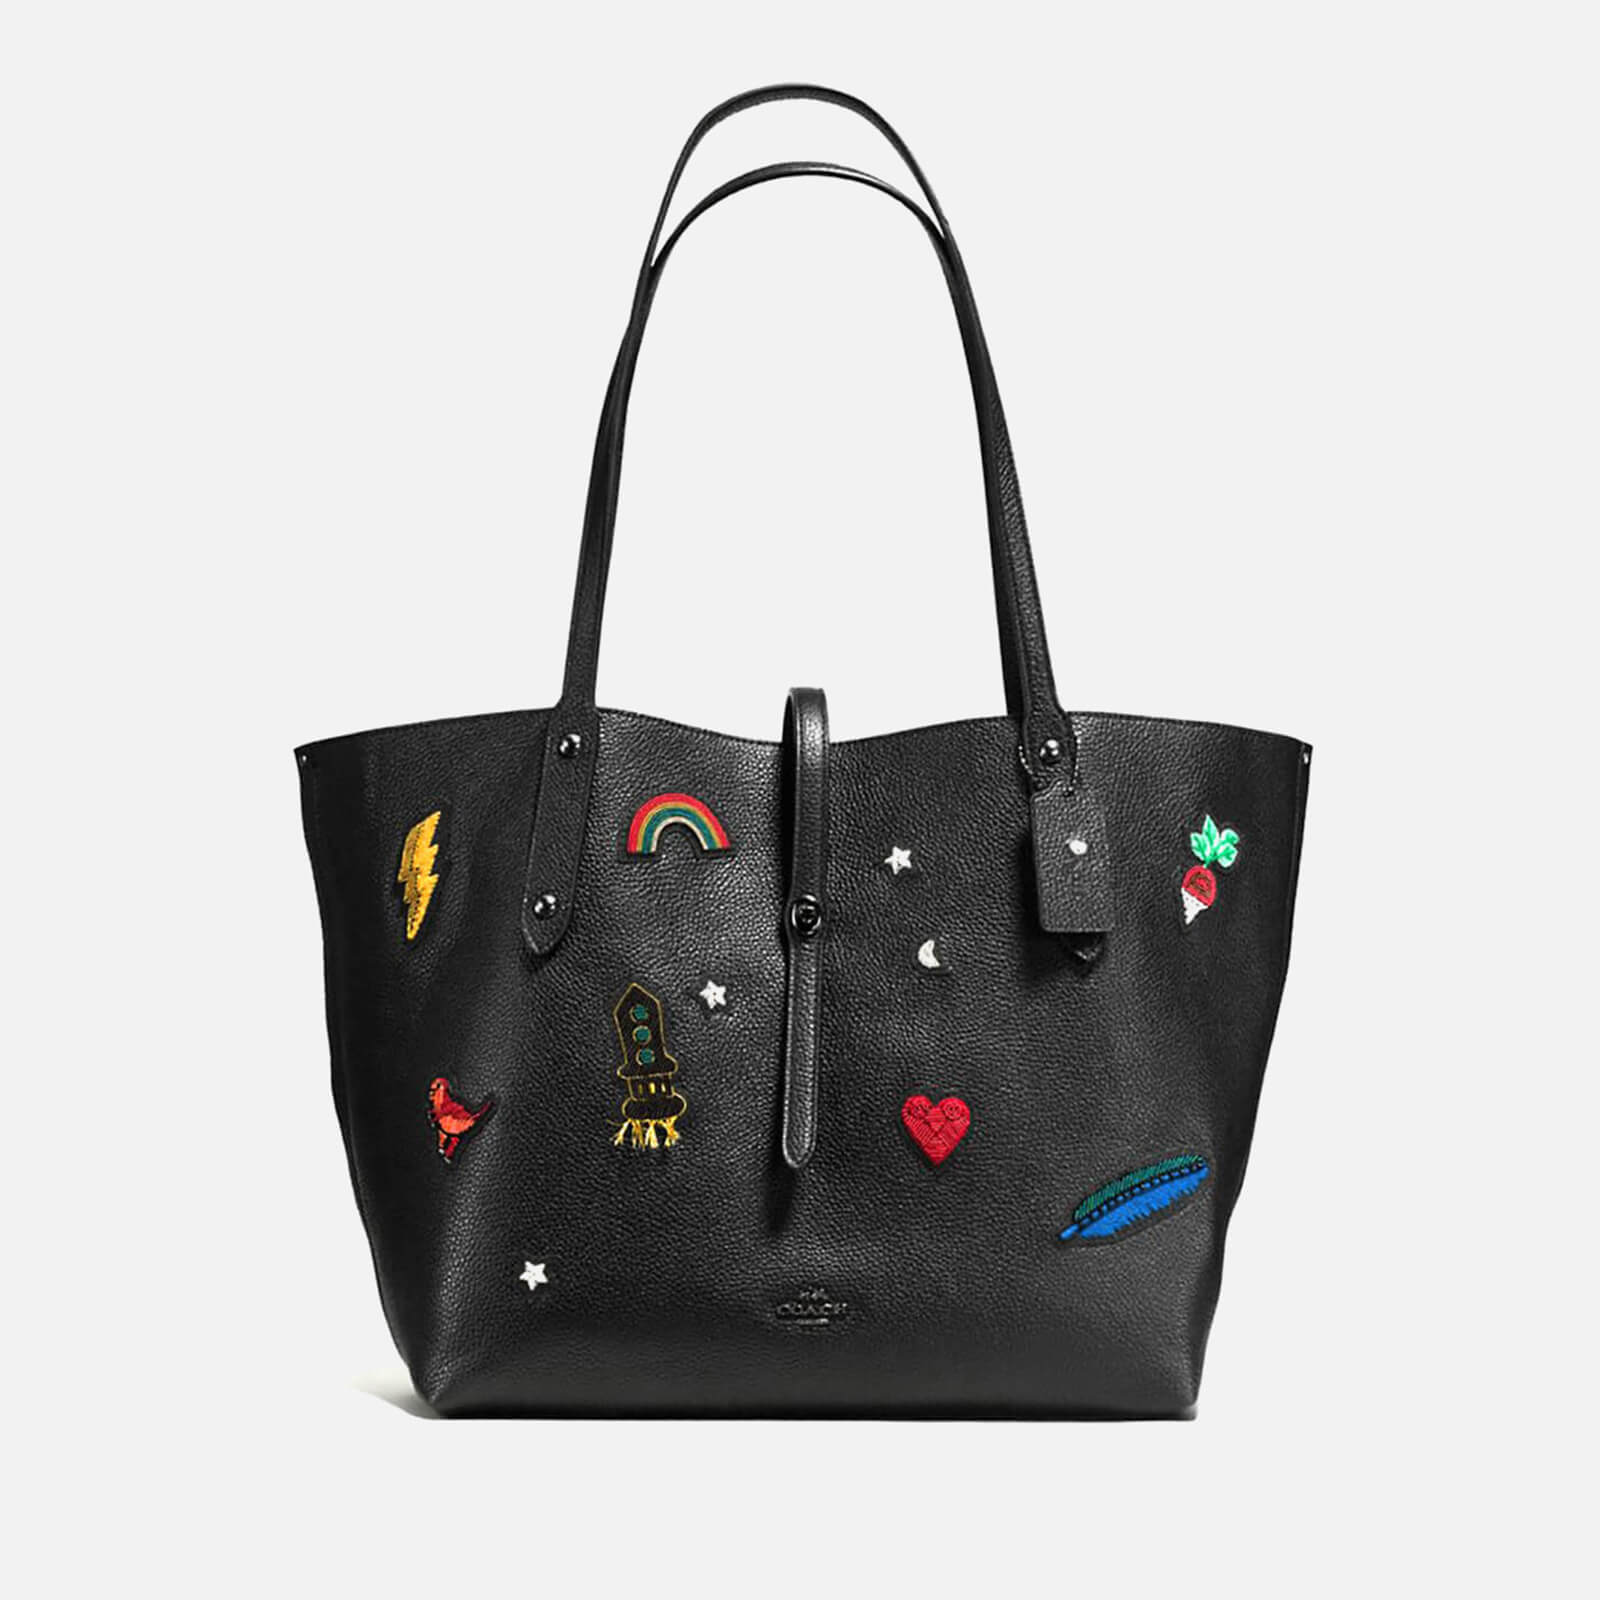 Coach Women s Market Tote Bag - Black - Free UK Delivery over £50 3d25484bd7